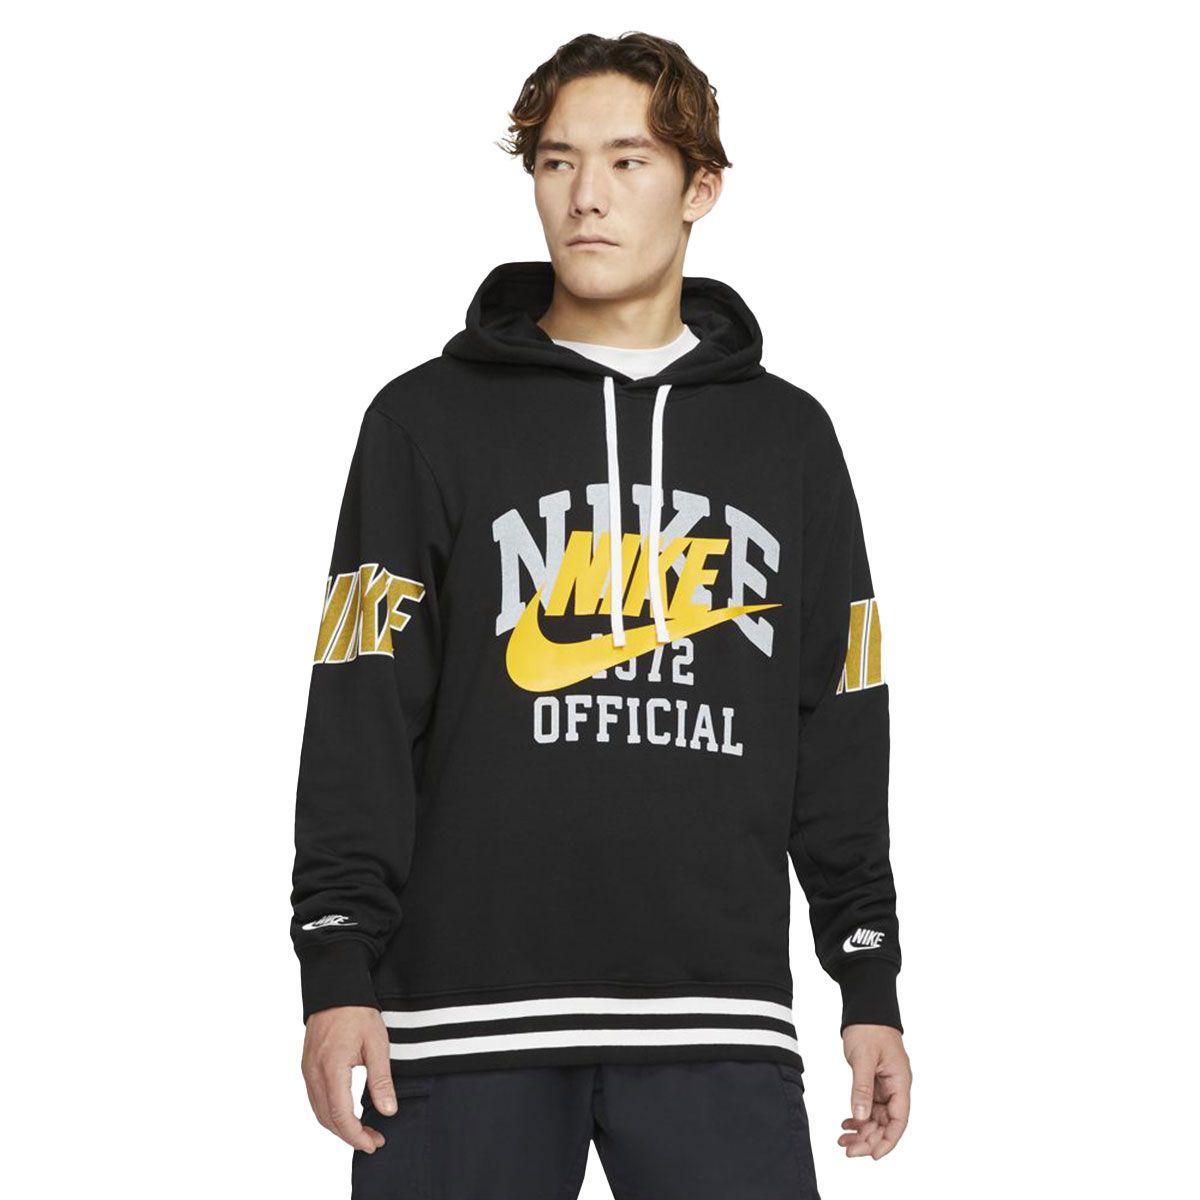 Nike Felpa Sportswear Uomo Nero